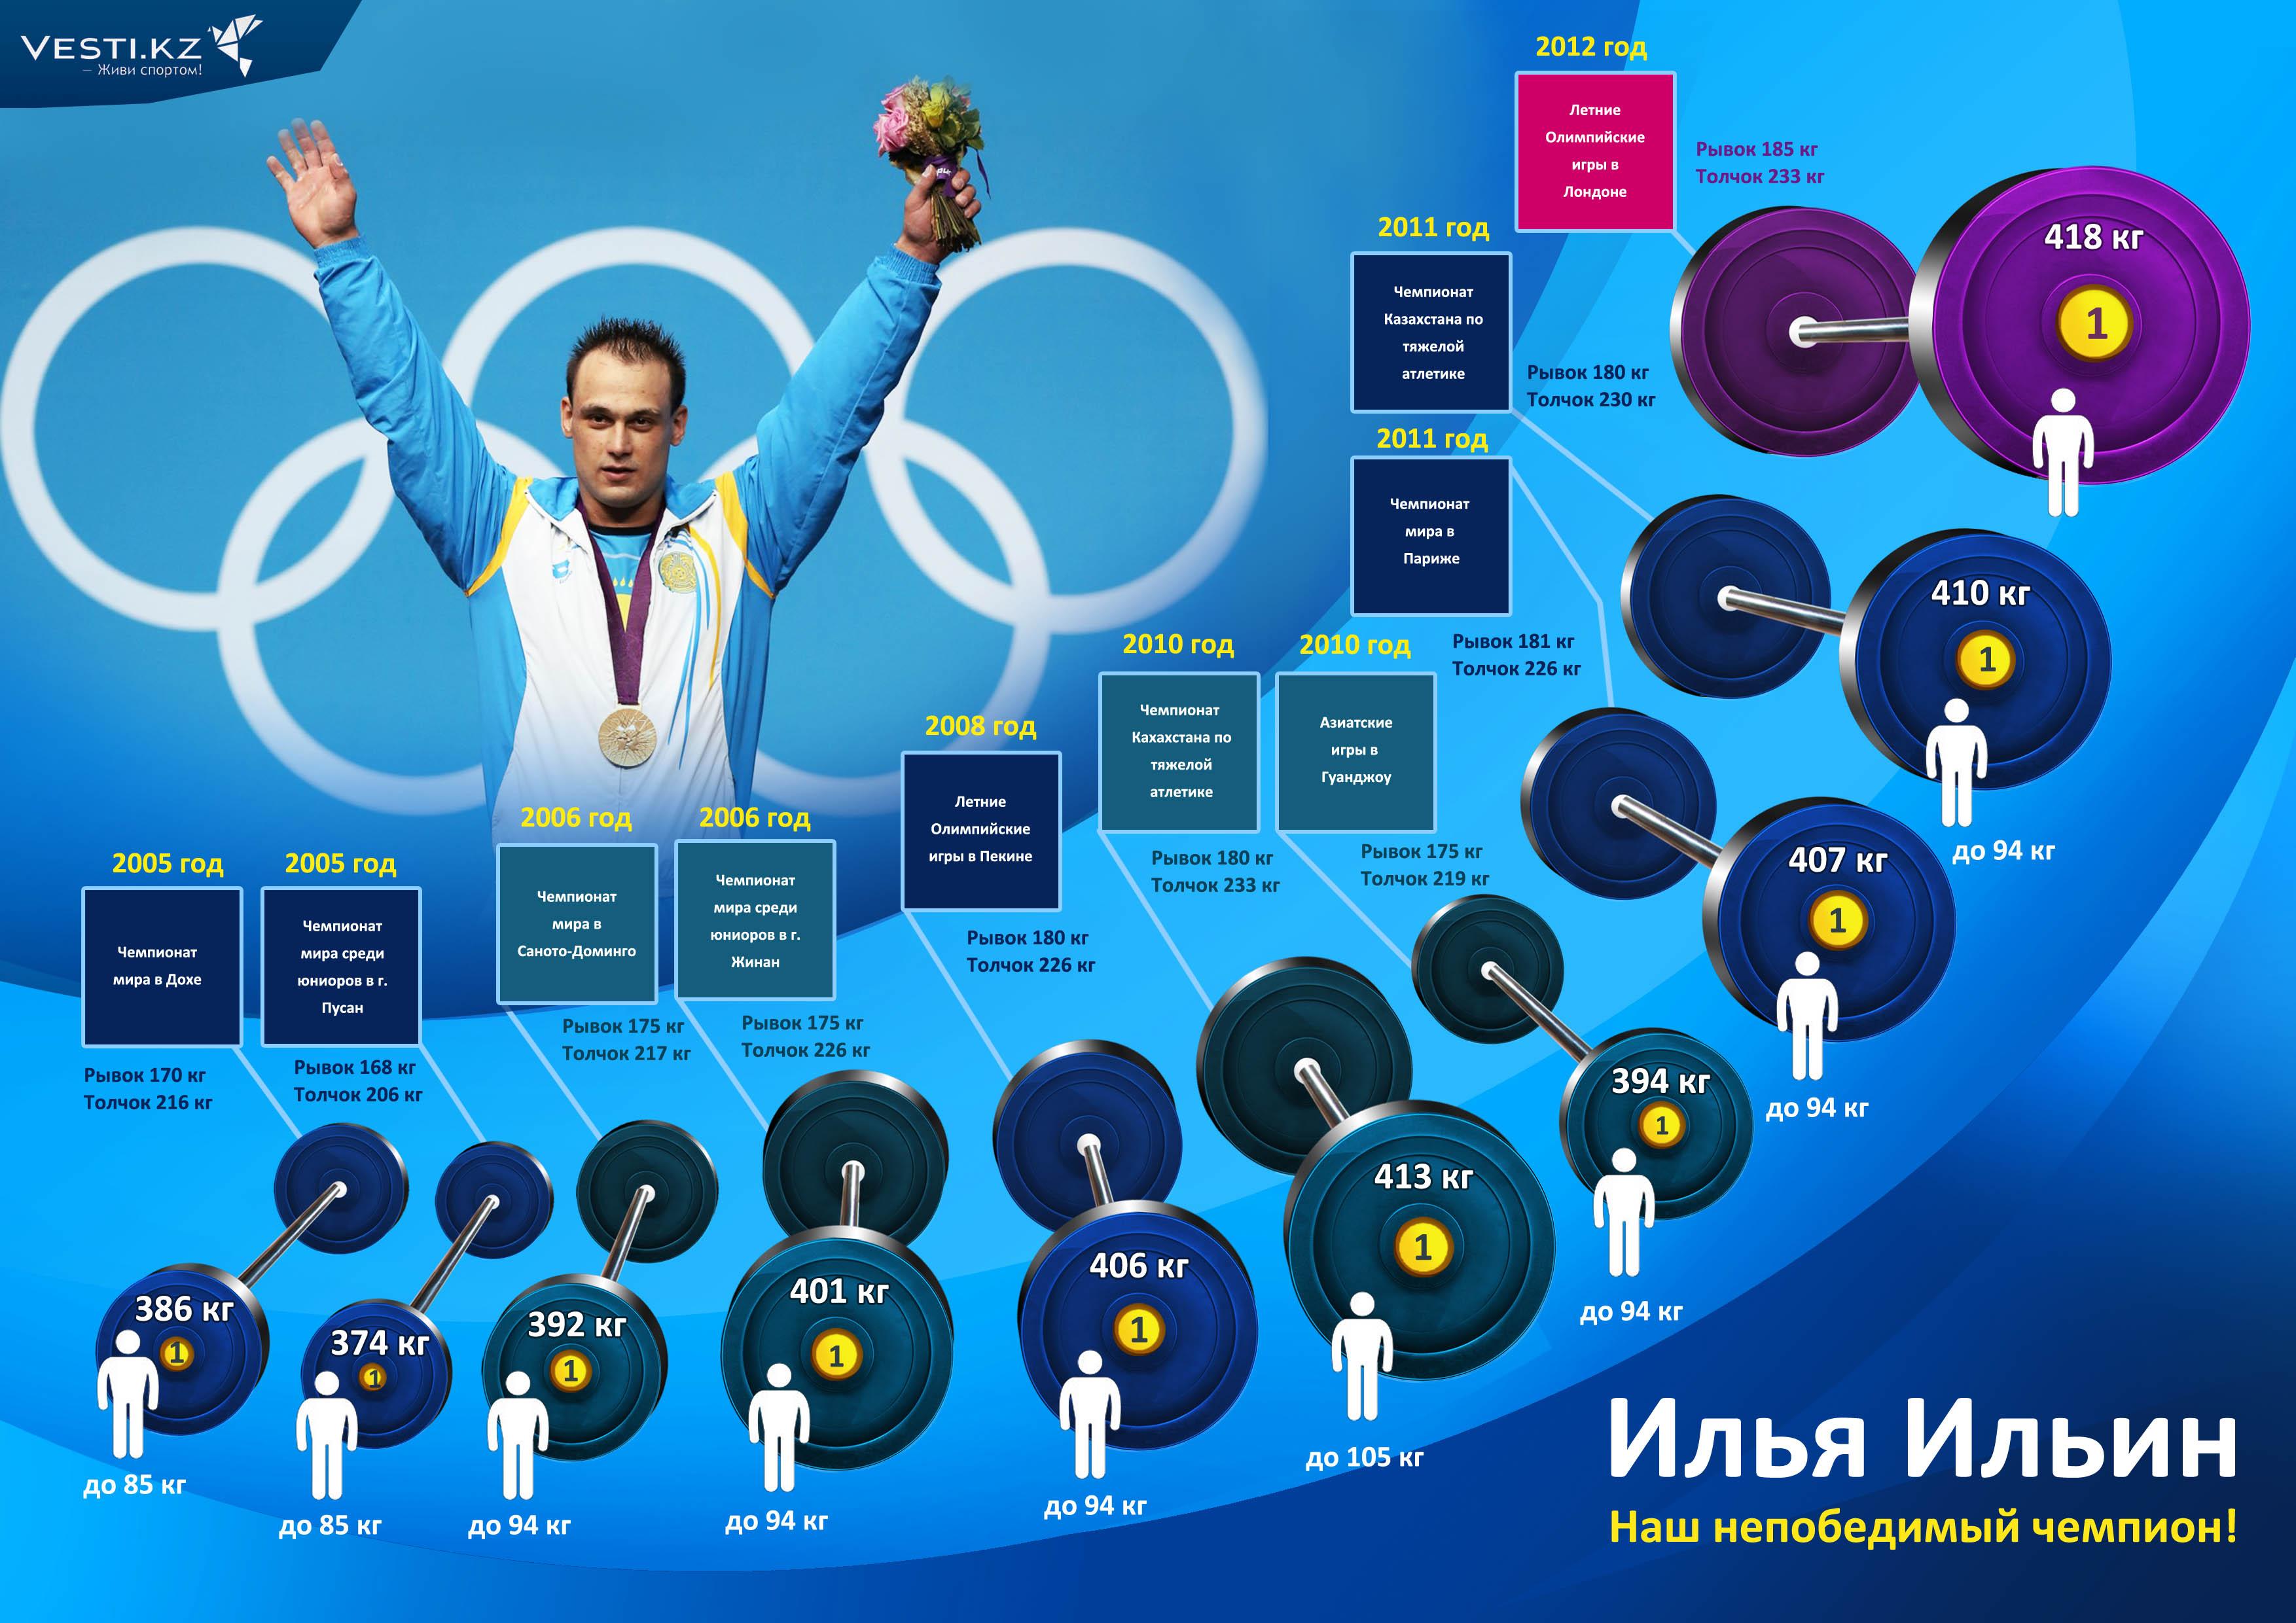 Ilya ilyin wallpaper